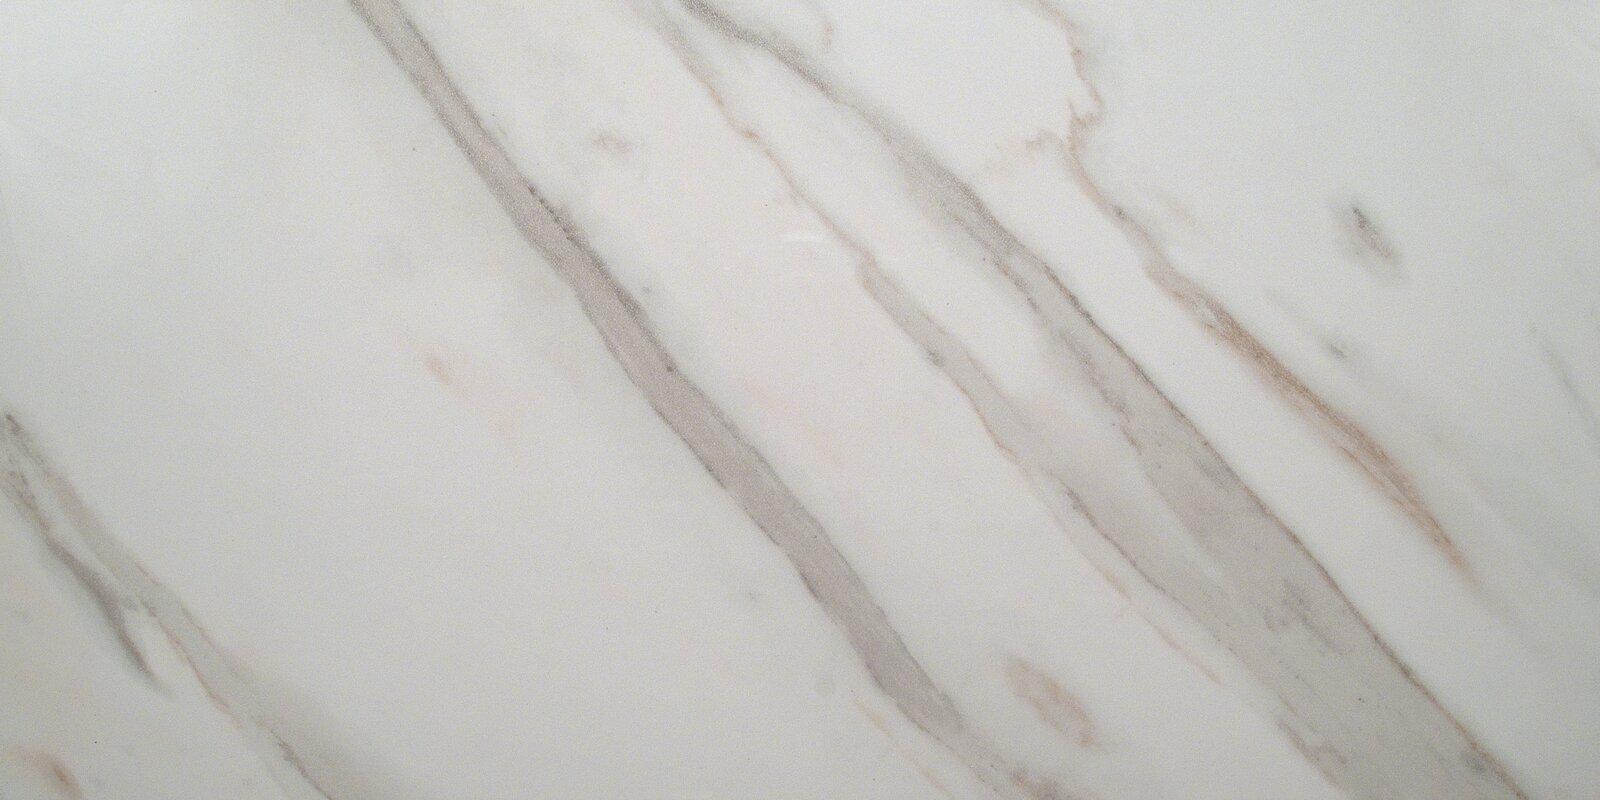 Pietra Calacatta 12 Quot X 24 Quot Porcelain Field Tile In White